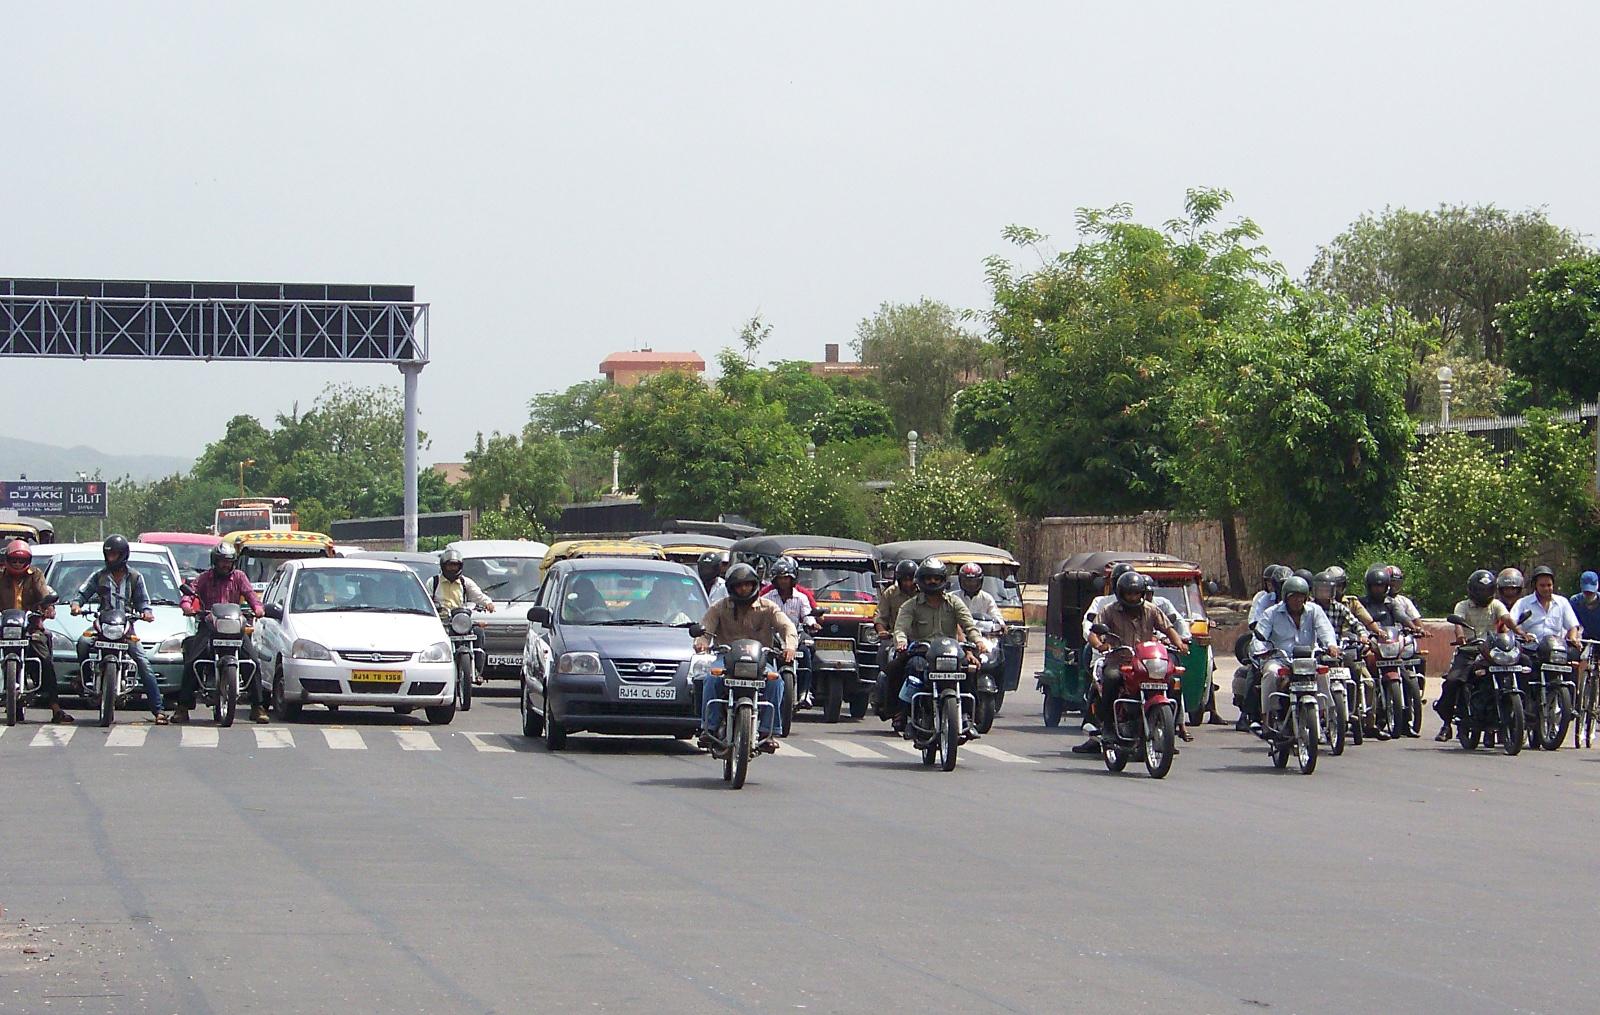 Motorcycles waiting at a light on Jawaharlal Nehru Marg, Jaipur.